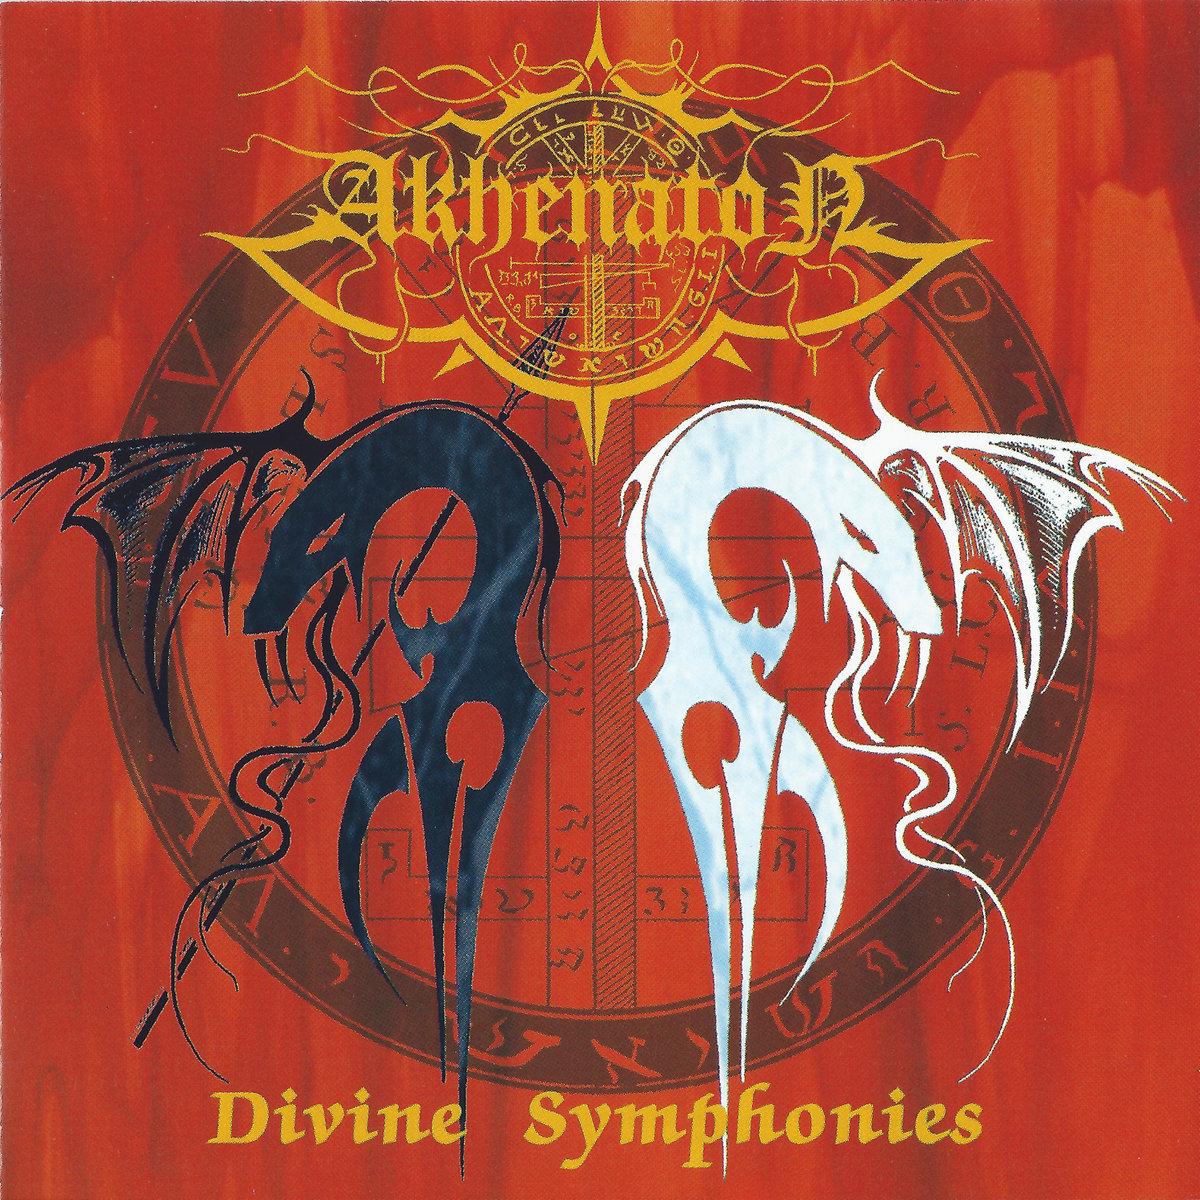 Akhenaton - Divine Symphonies (1995)